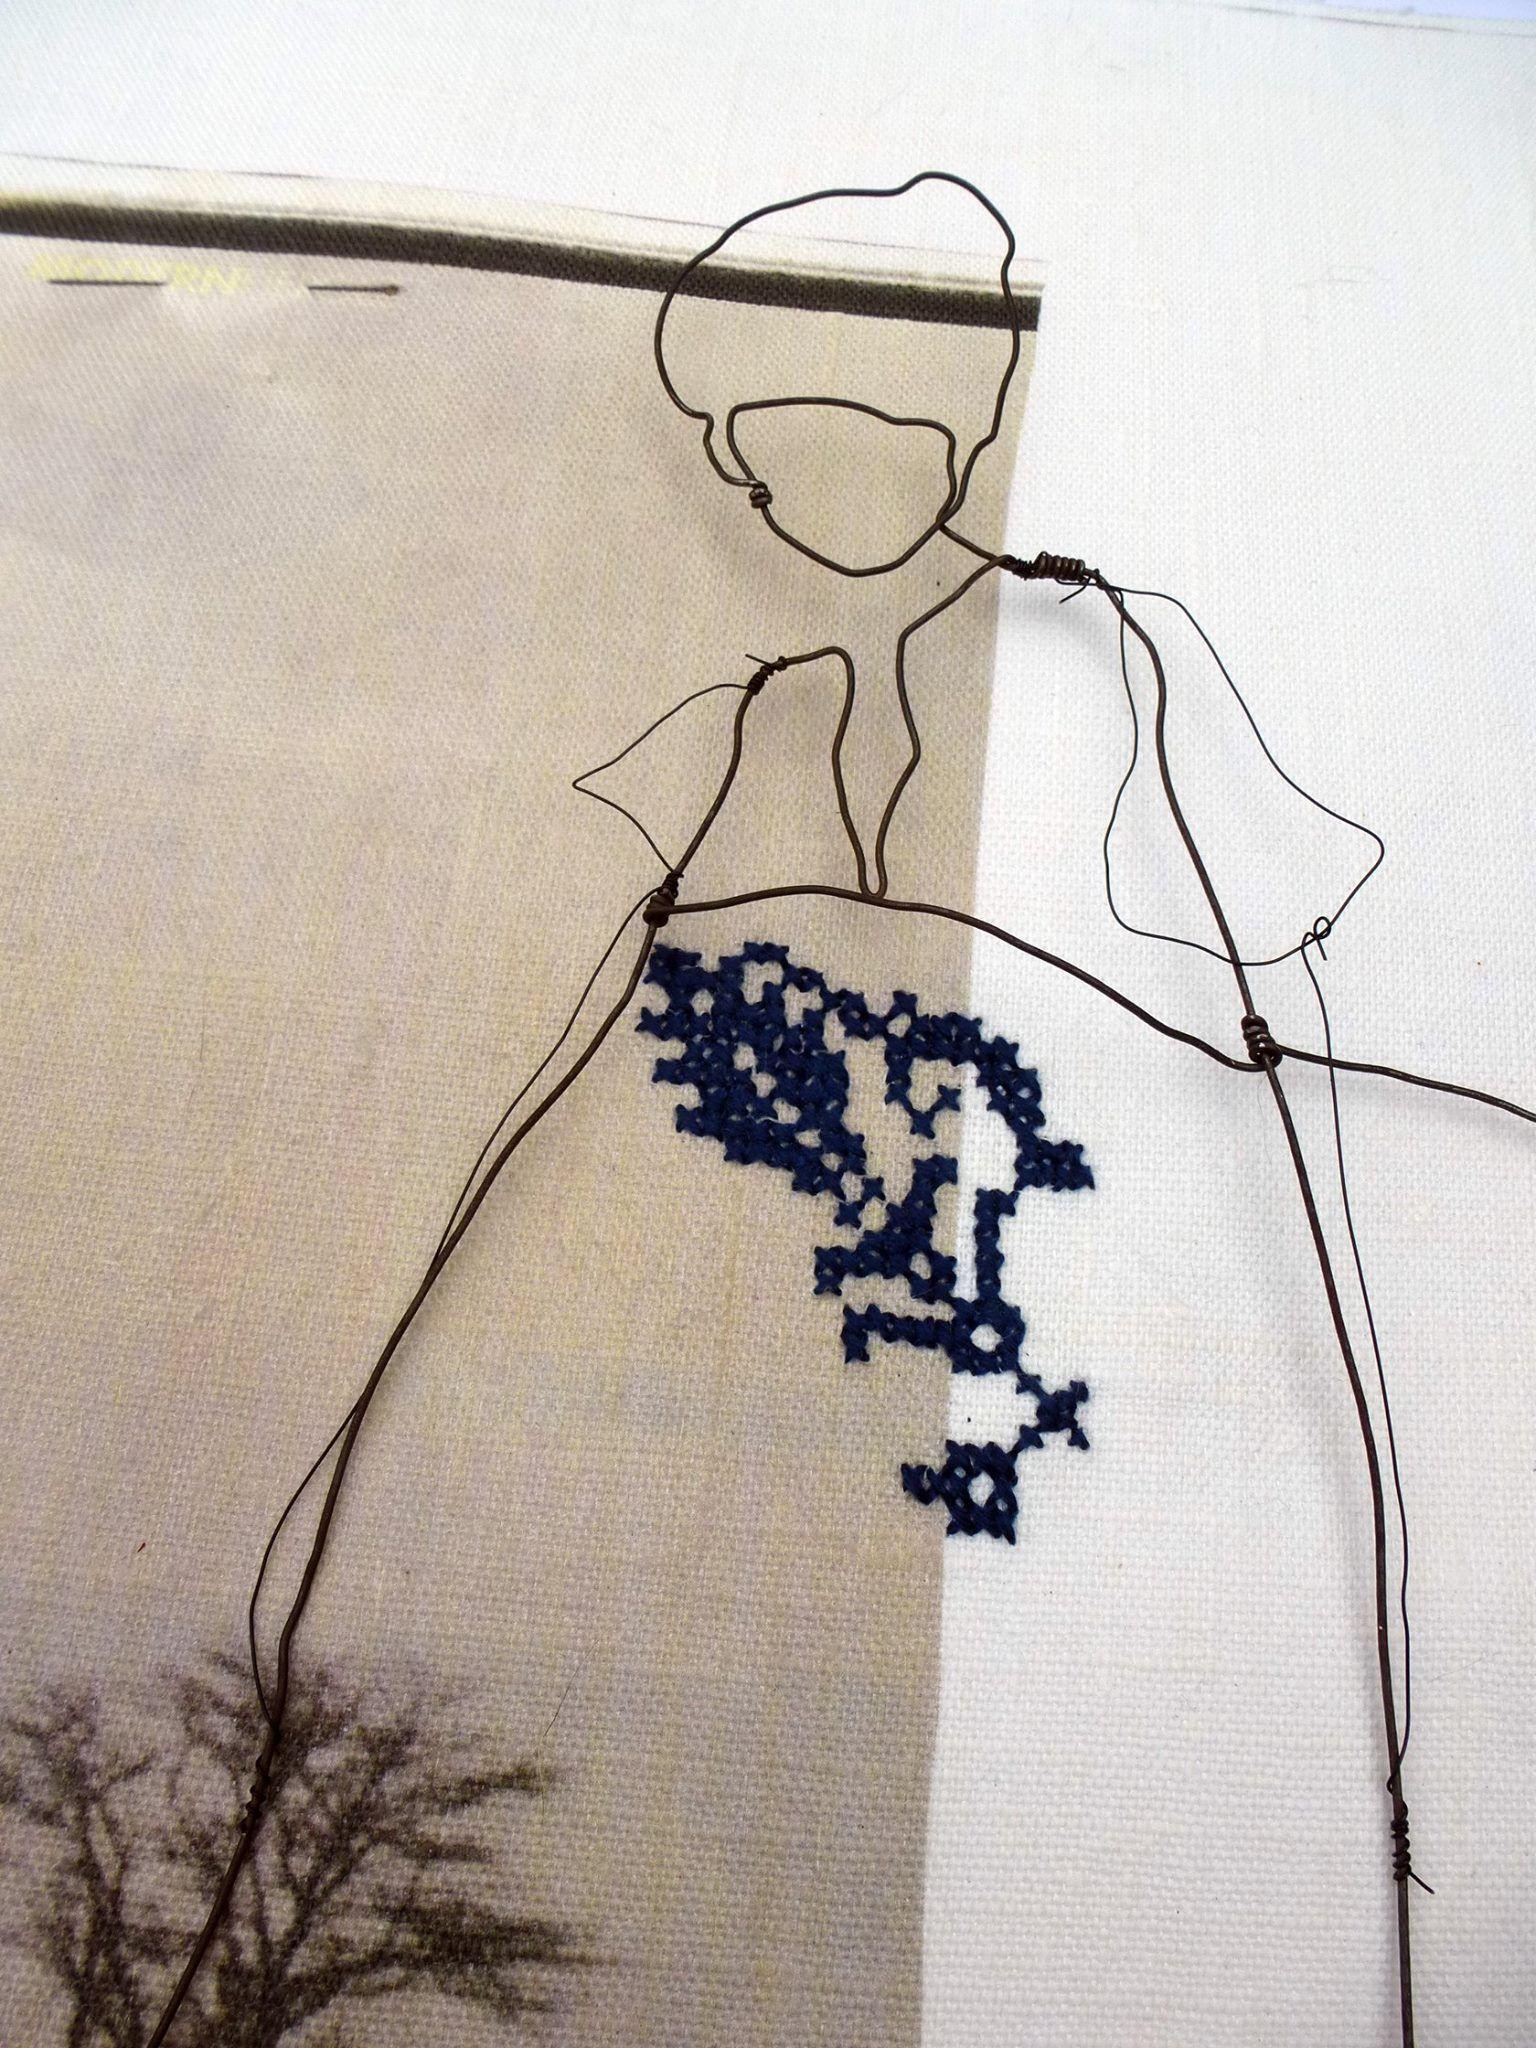 Julia Jowlett mixed media - wirework with stitchery on textiles